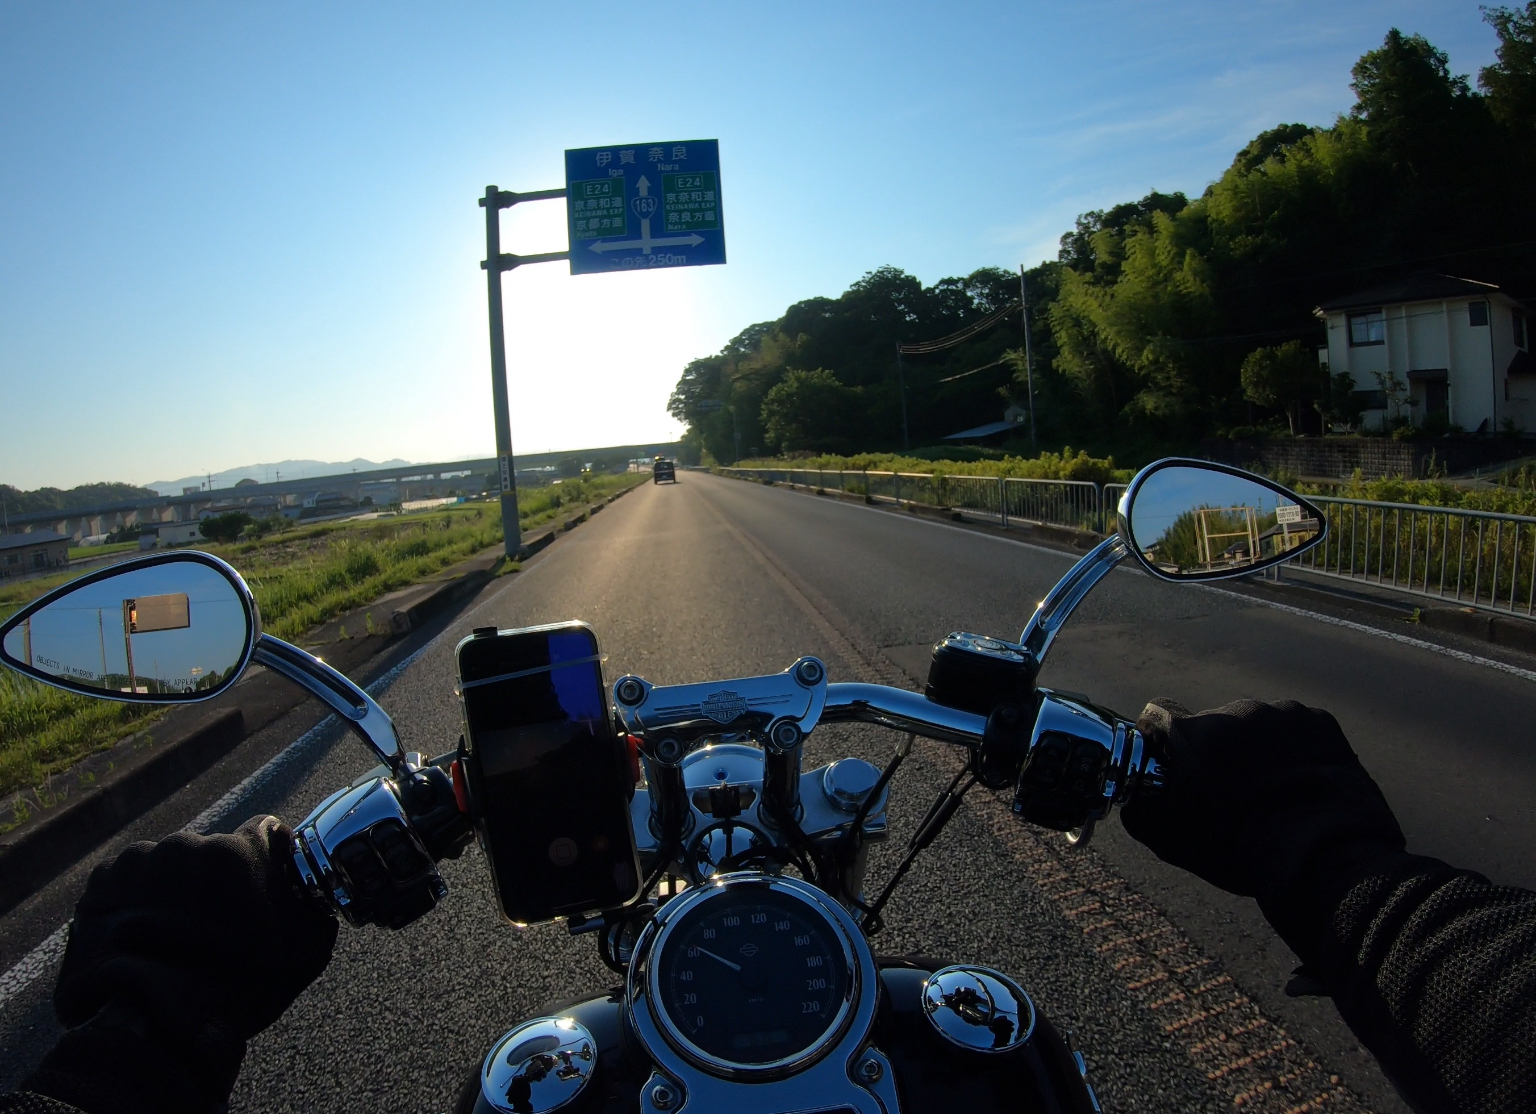 harleydavidson-motorcycle-touring-blog-wakayama-rute163.jpg